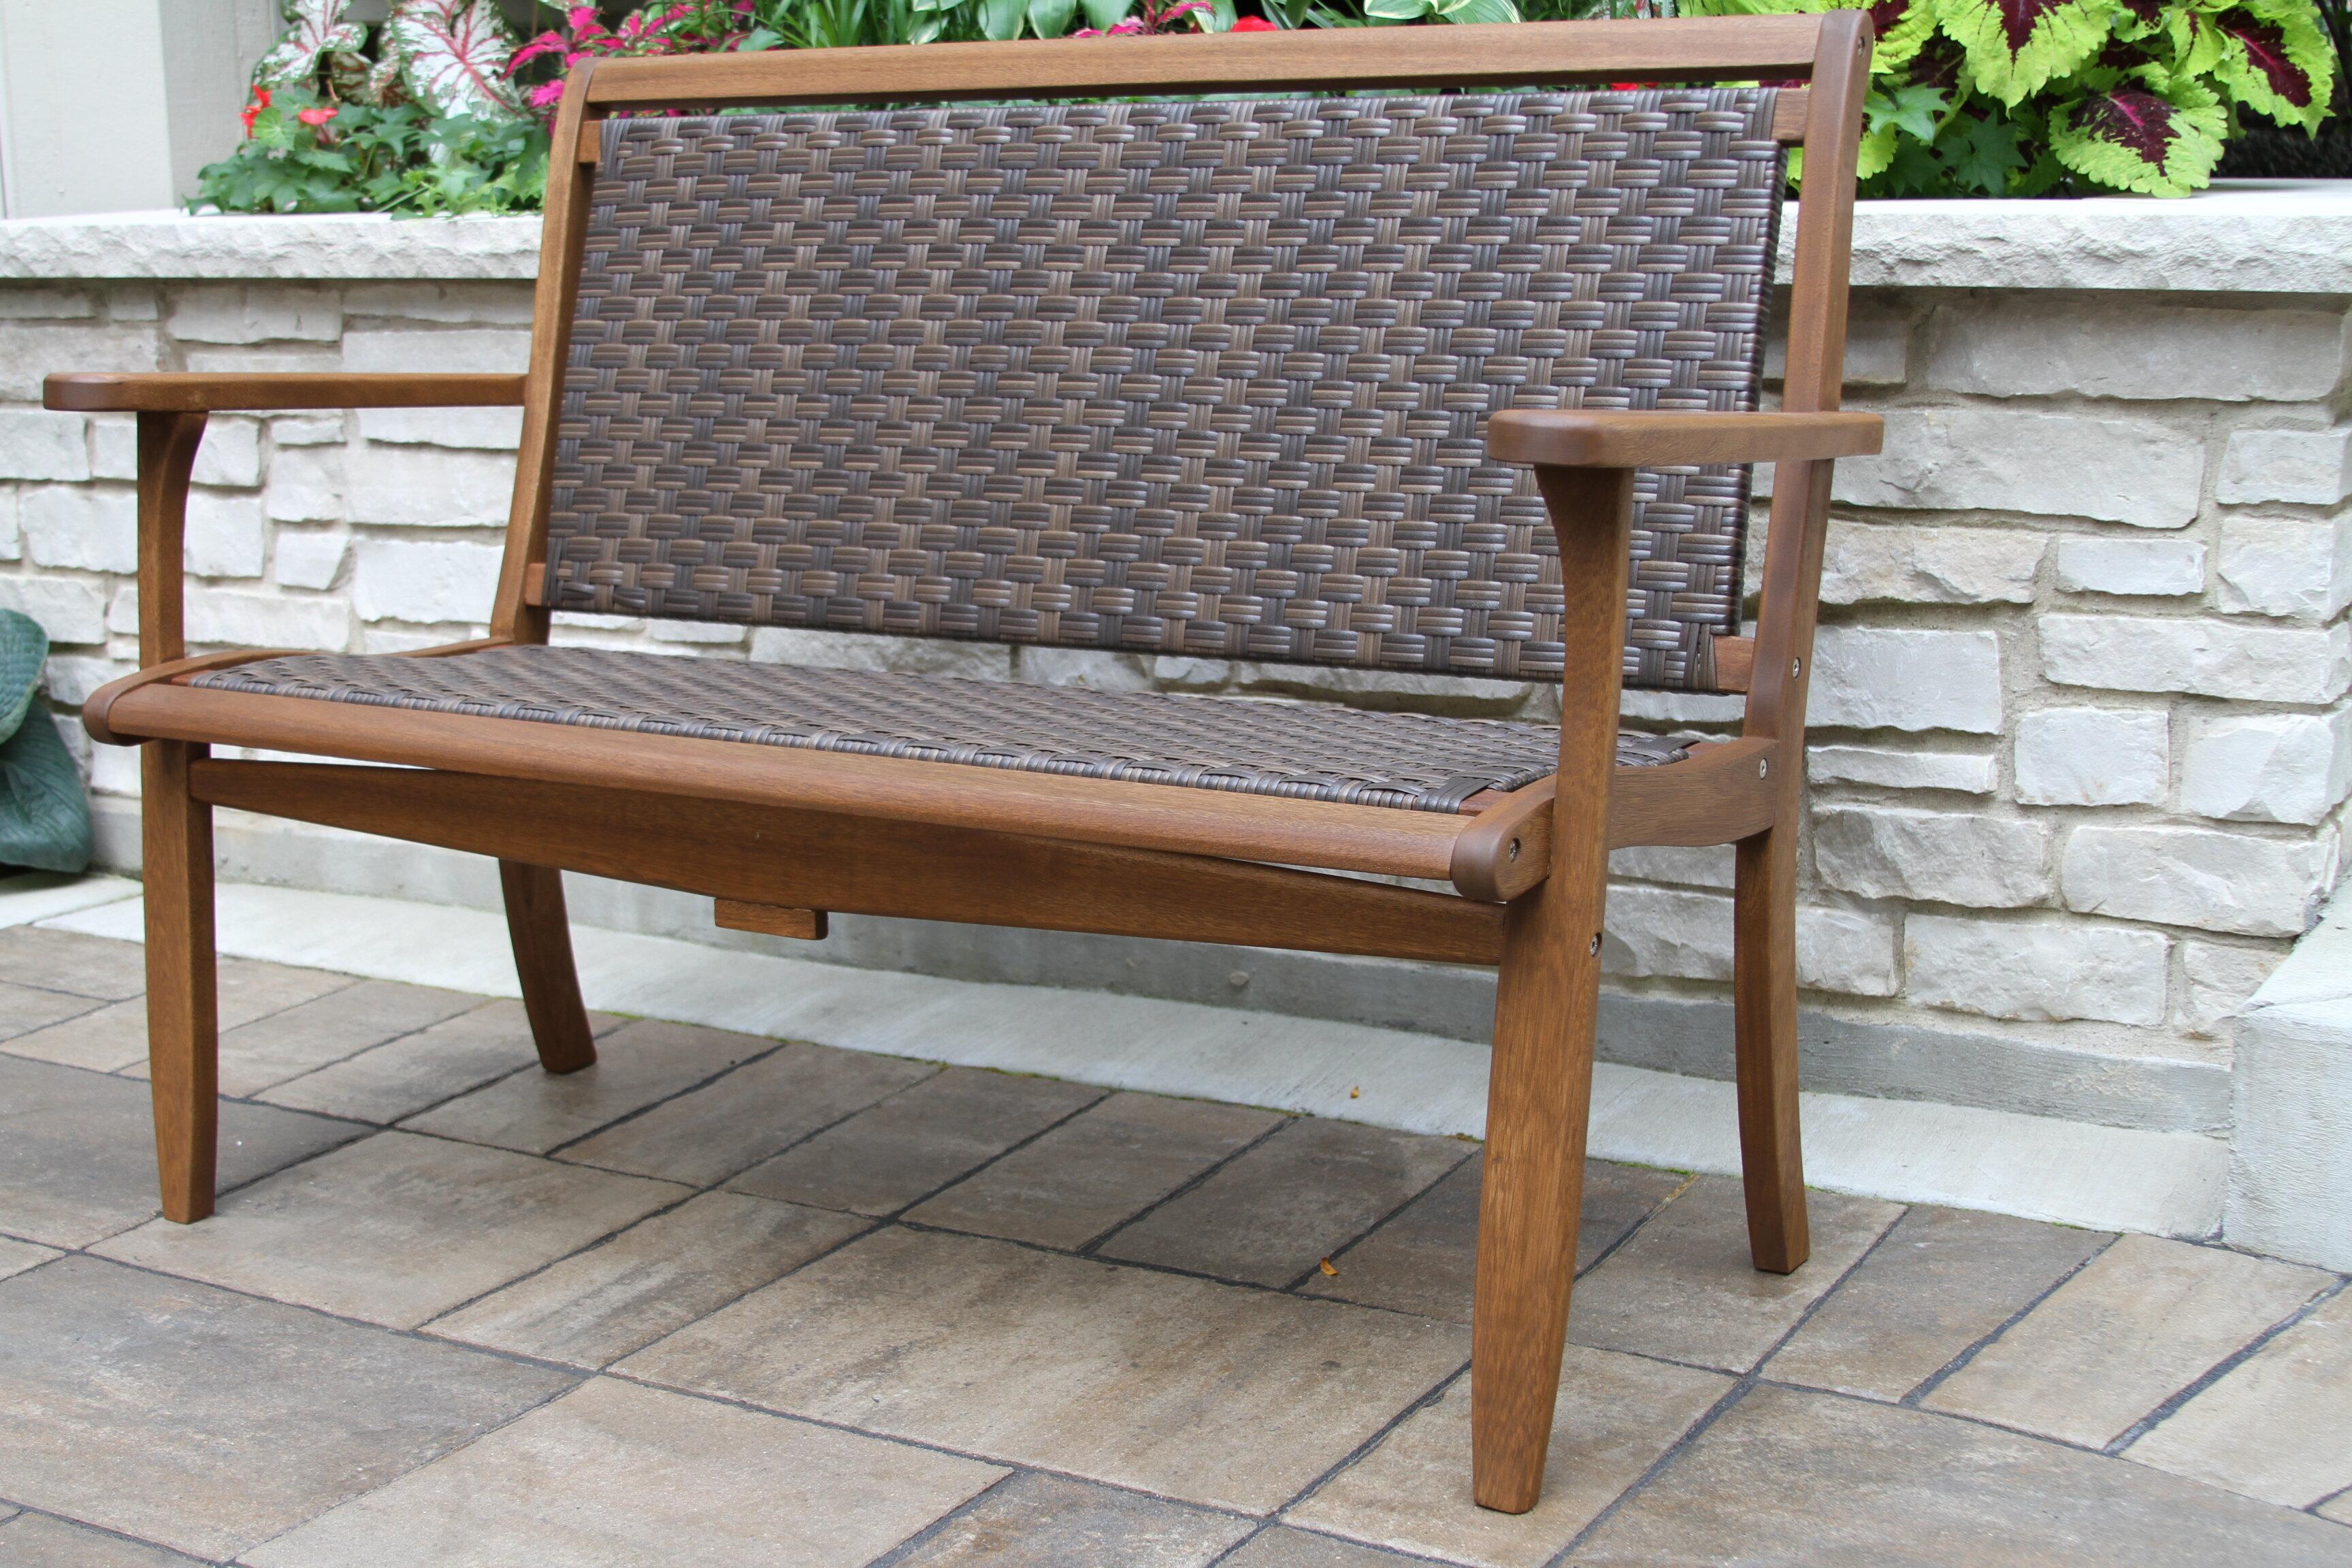 Nathen Lounger Wooden Garden Bench